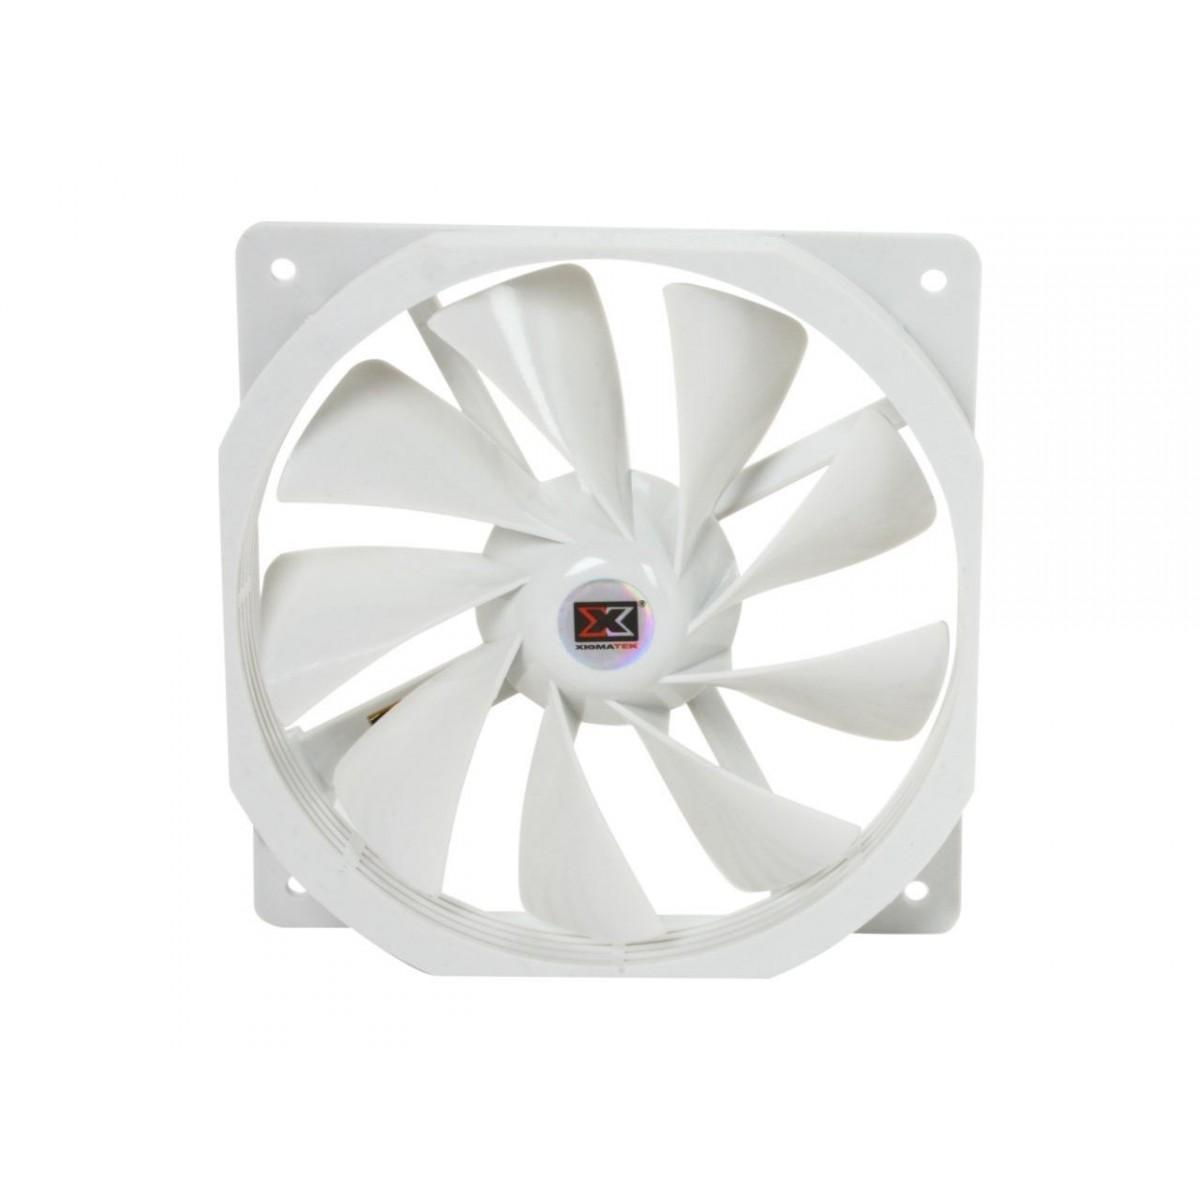 Cooler Xigmatek XOF-F1251 120mm White